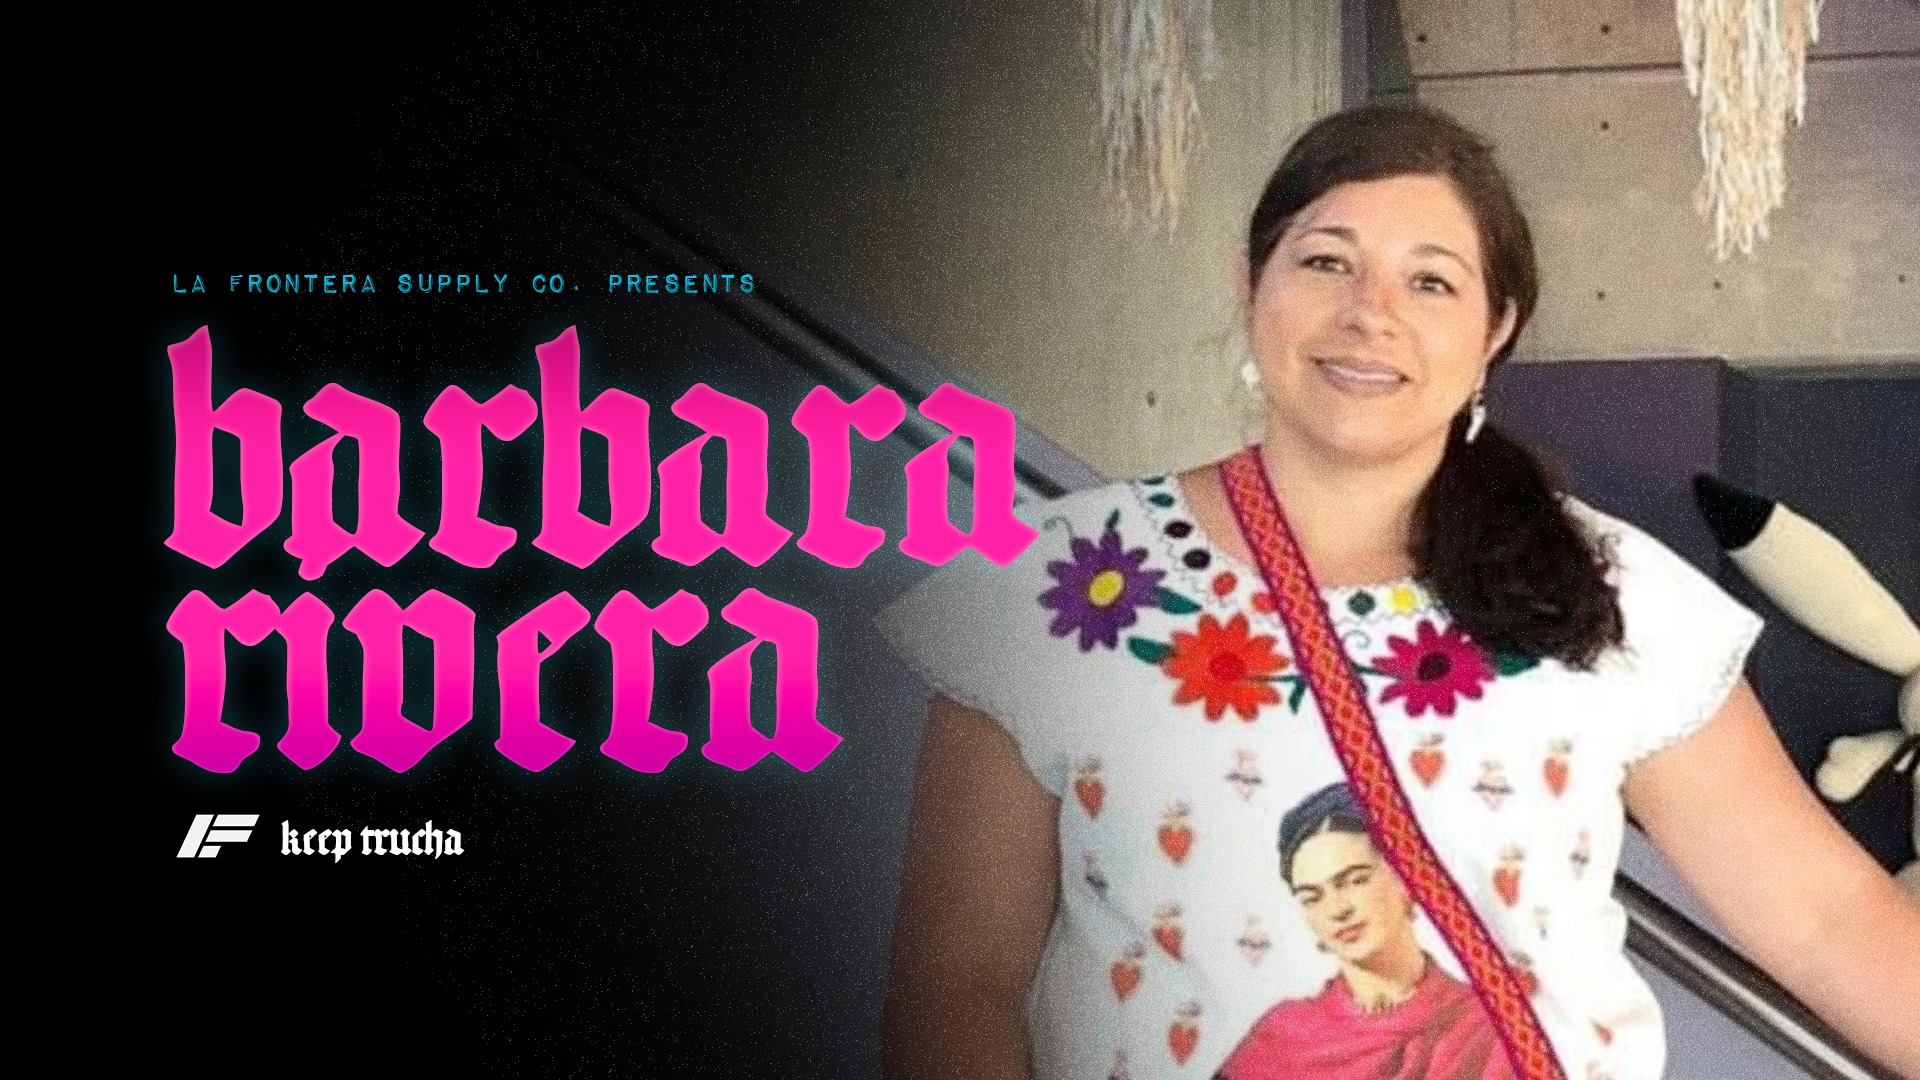 Barbara Rivera: The Beauty Found In Art & Culture - Keep Trucha | Episode 003February 12, 2019